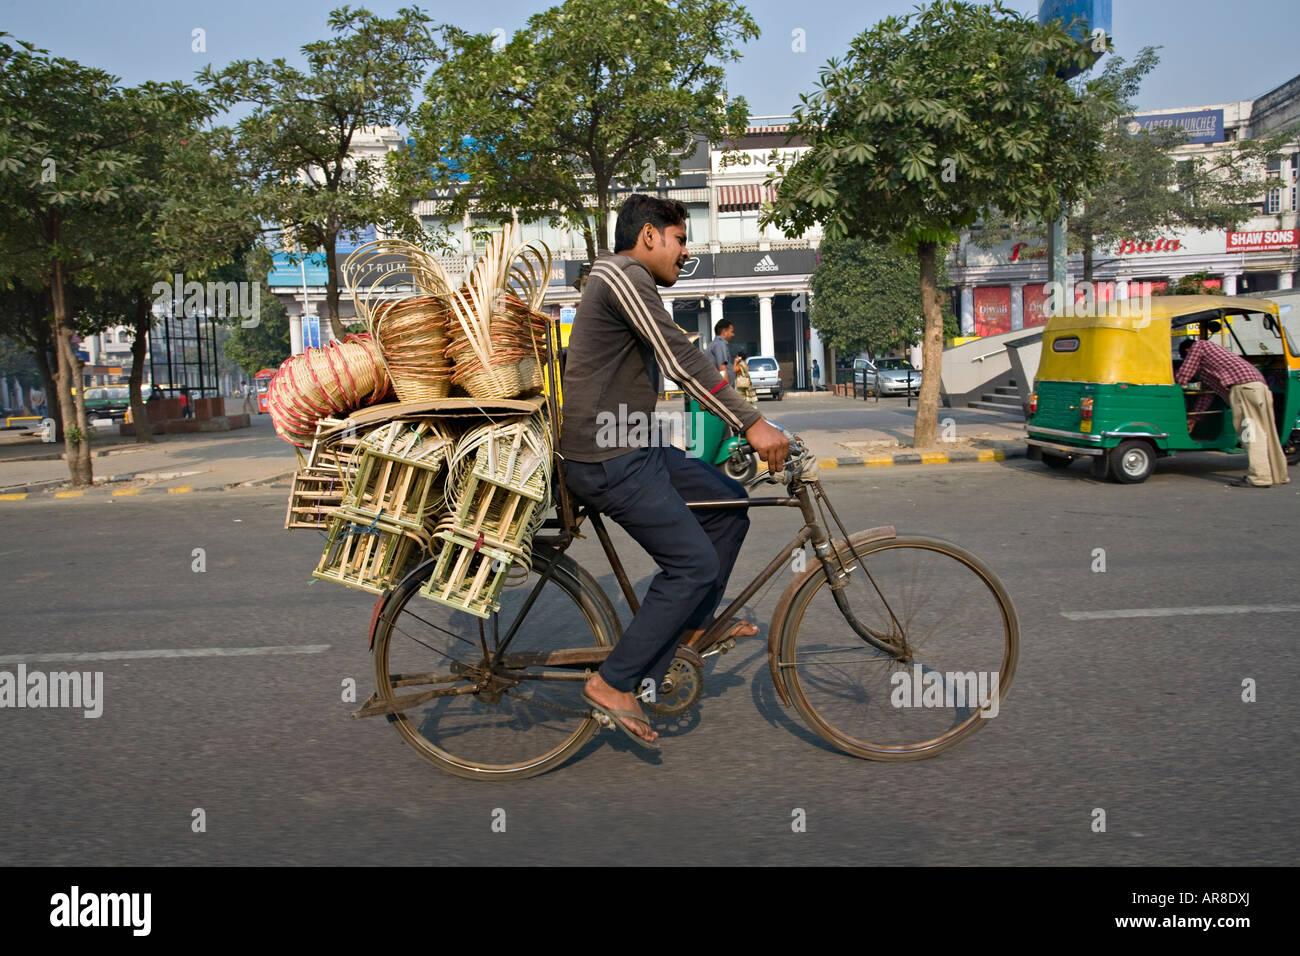 Indian uomo su una bicicletta, Netagi Subhash Marg, Delhi, India Immagini Stock